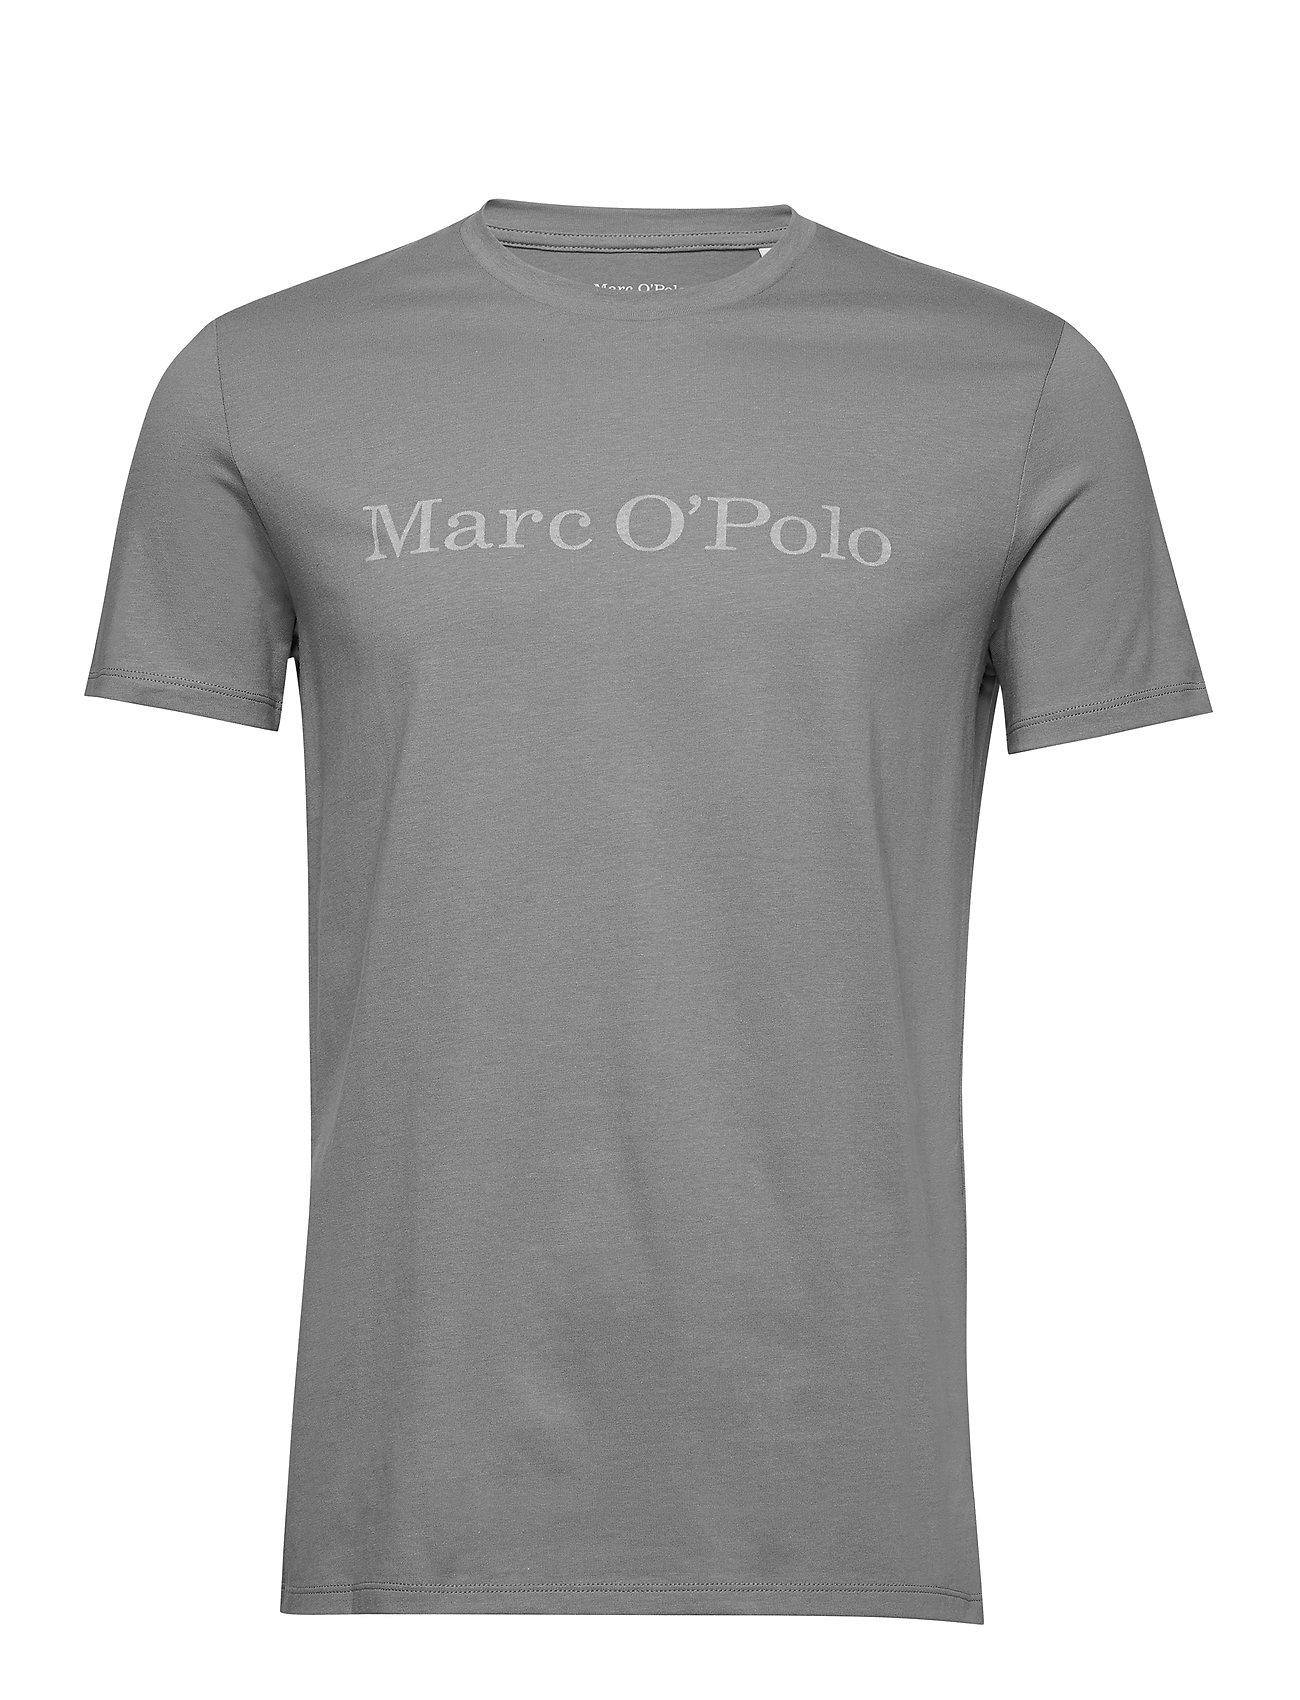 Marc O'Polo T-shirt Short Sleeve - GRIFFIN